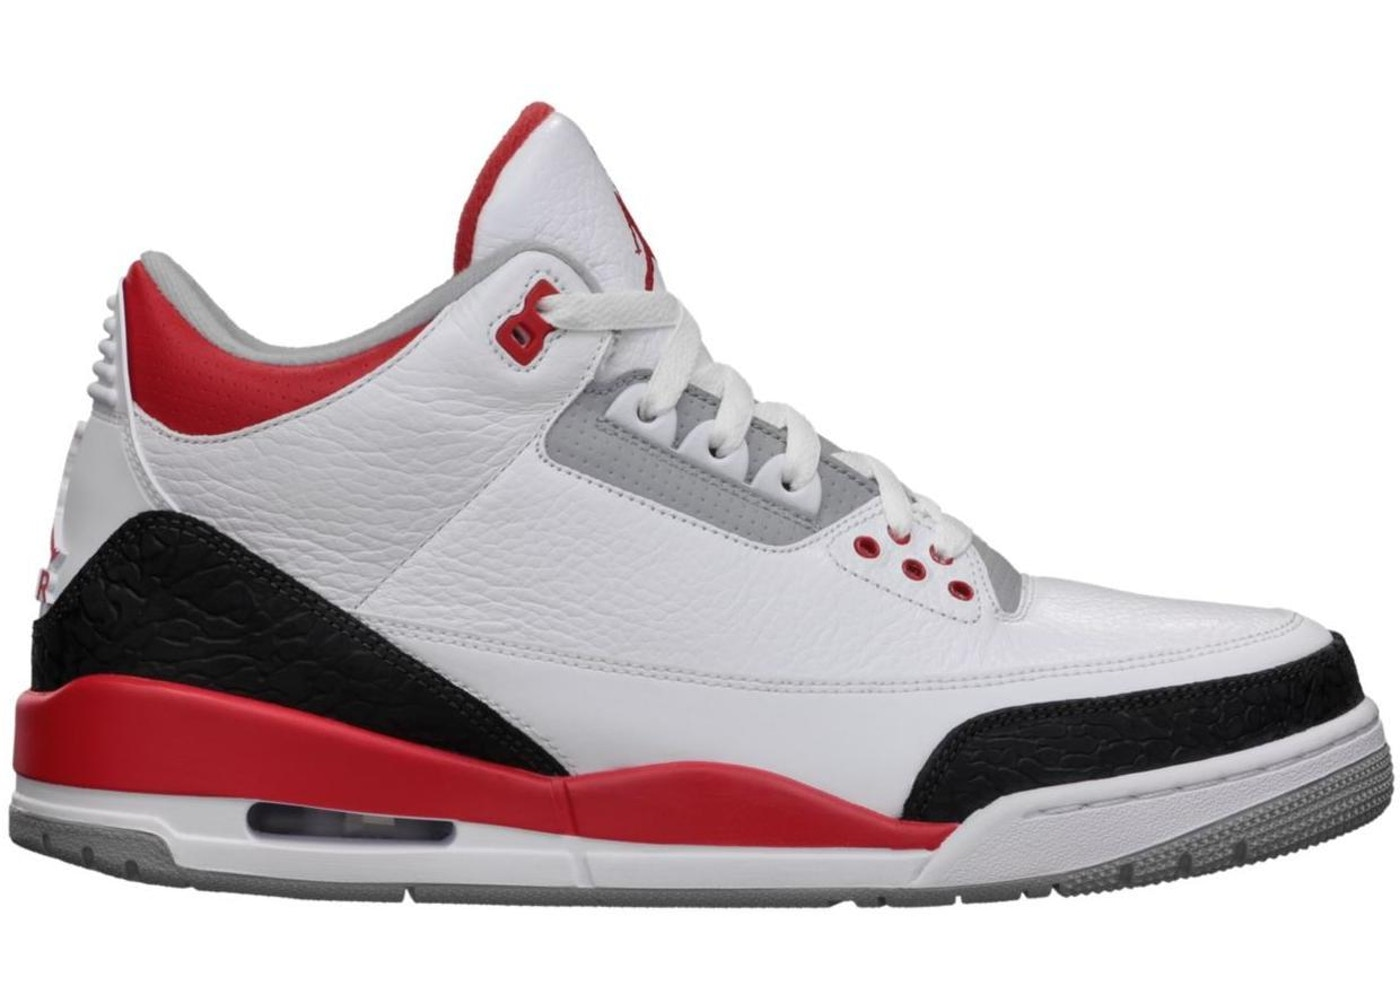 Jordan 3 Retro Fire Red (2013) - 136064-120 1c07bc05b